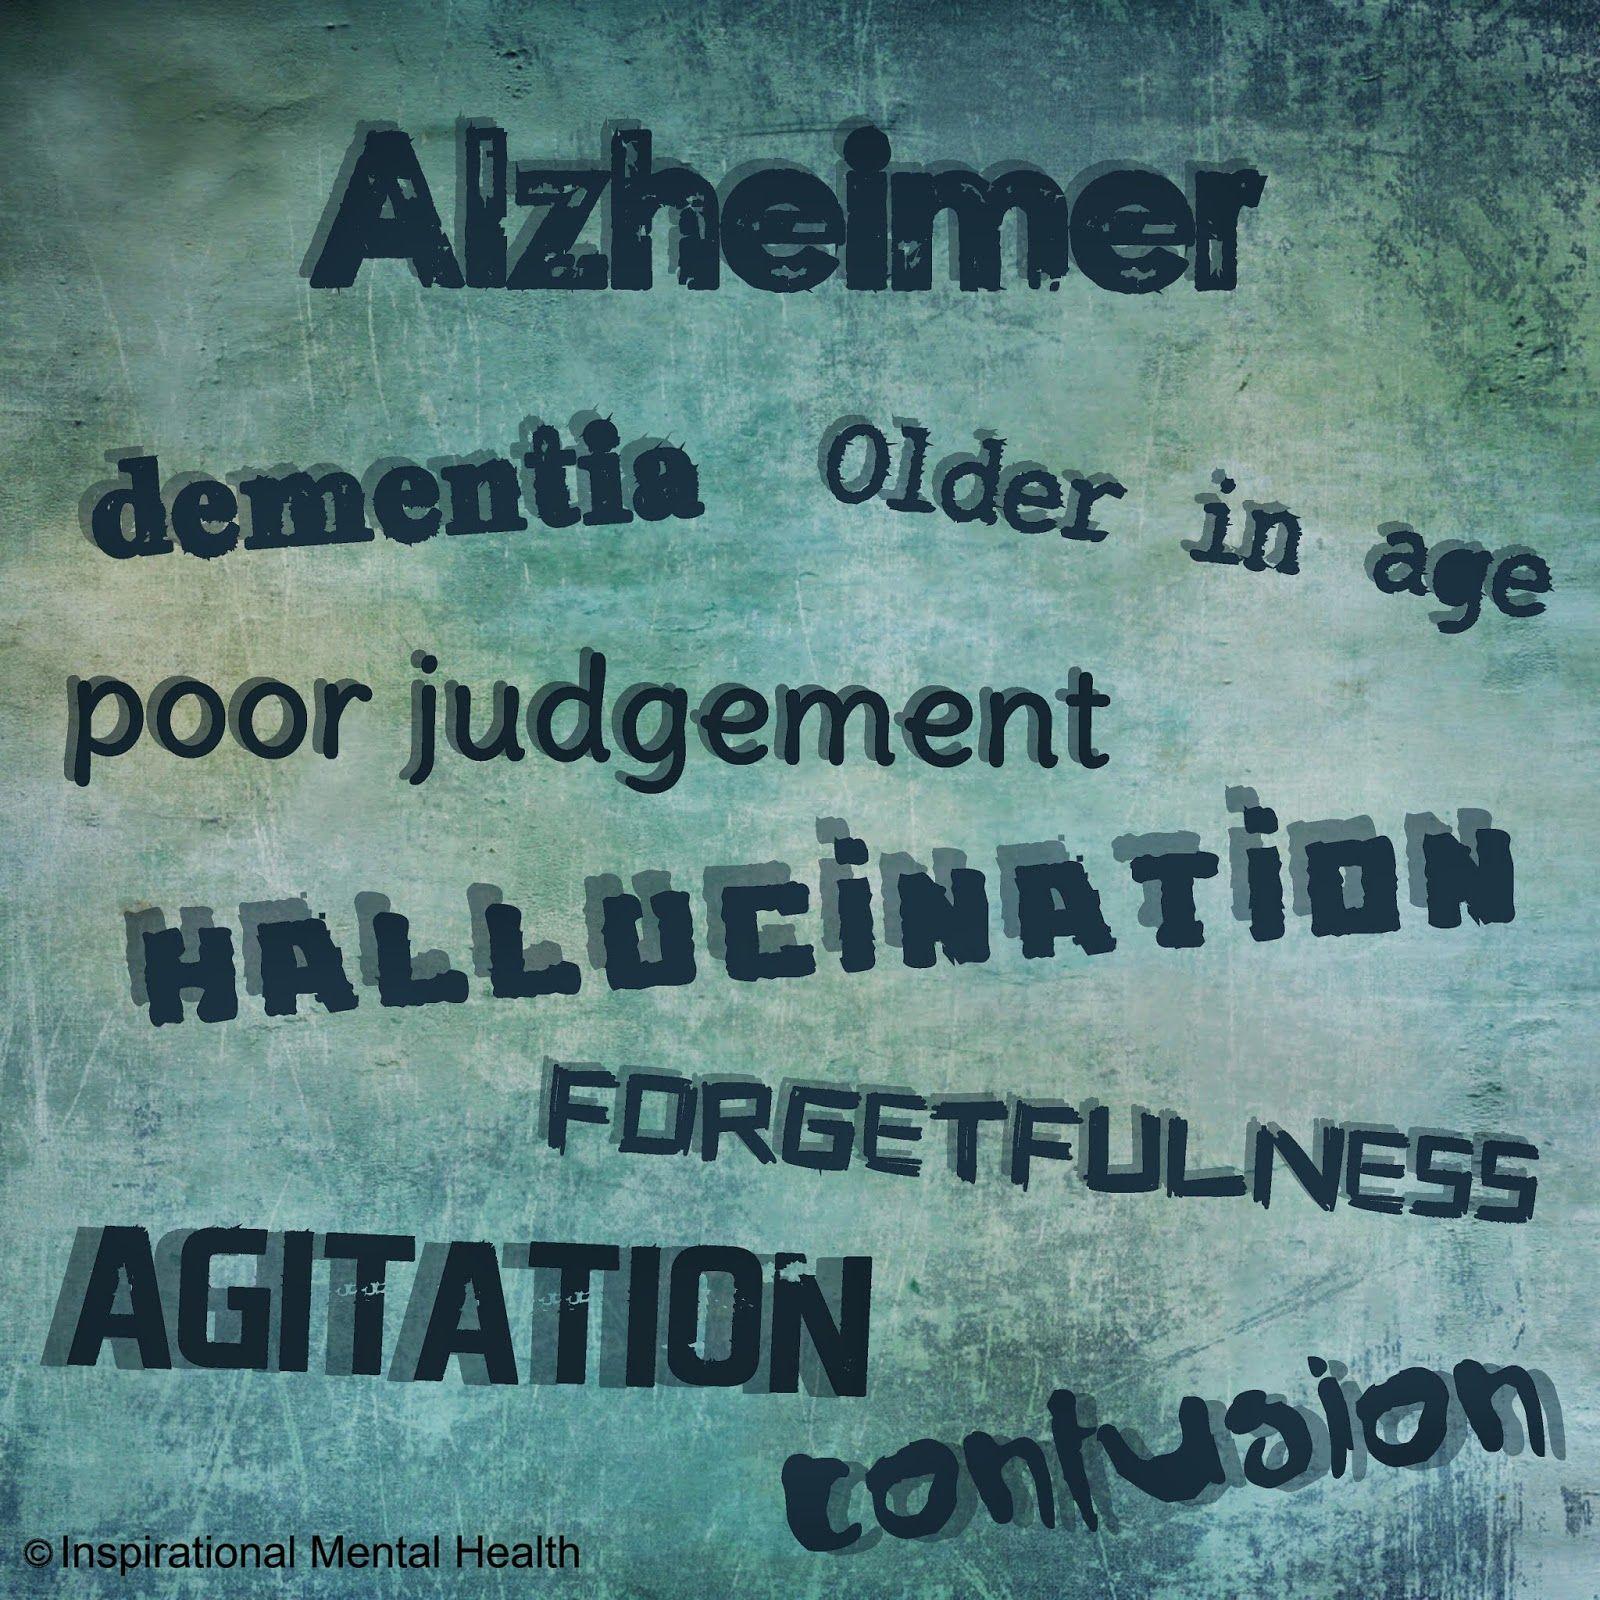 Alzheimer - Mental Disorders | Inspirational Mental Health | www.inspirationalmentalhealth.com